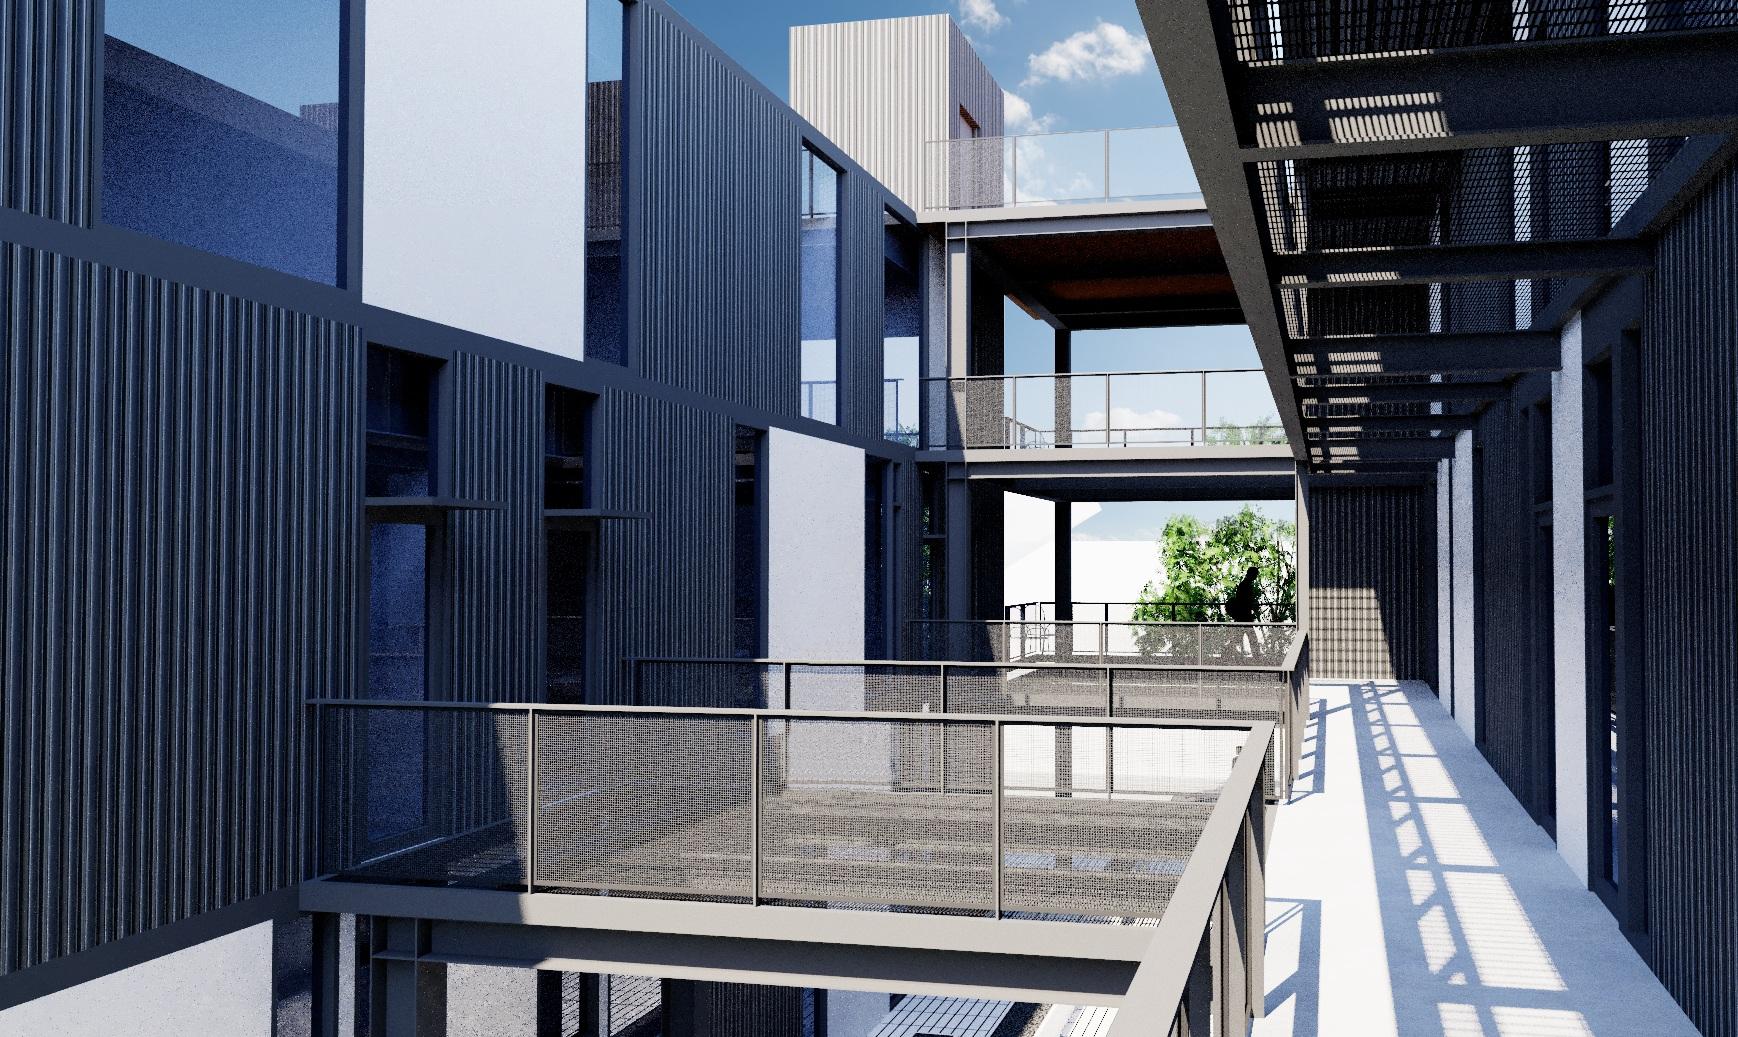 NEW LIVE-WORK RENTAL HOUSING_MENLO PARK, CA